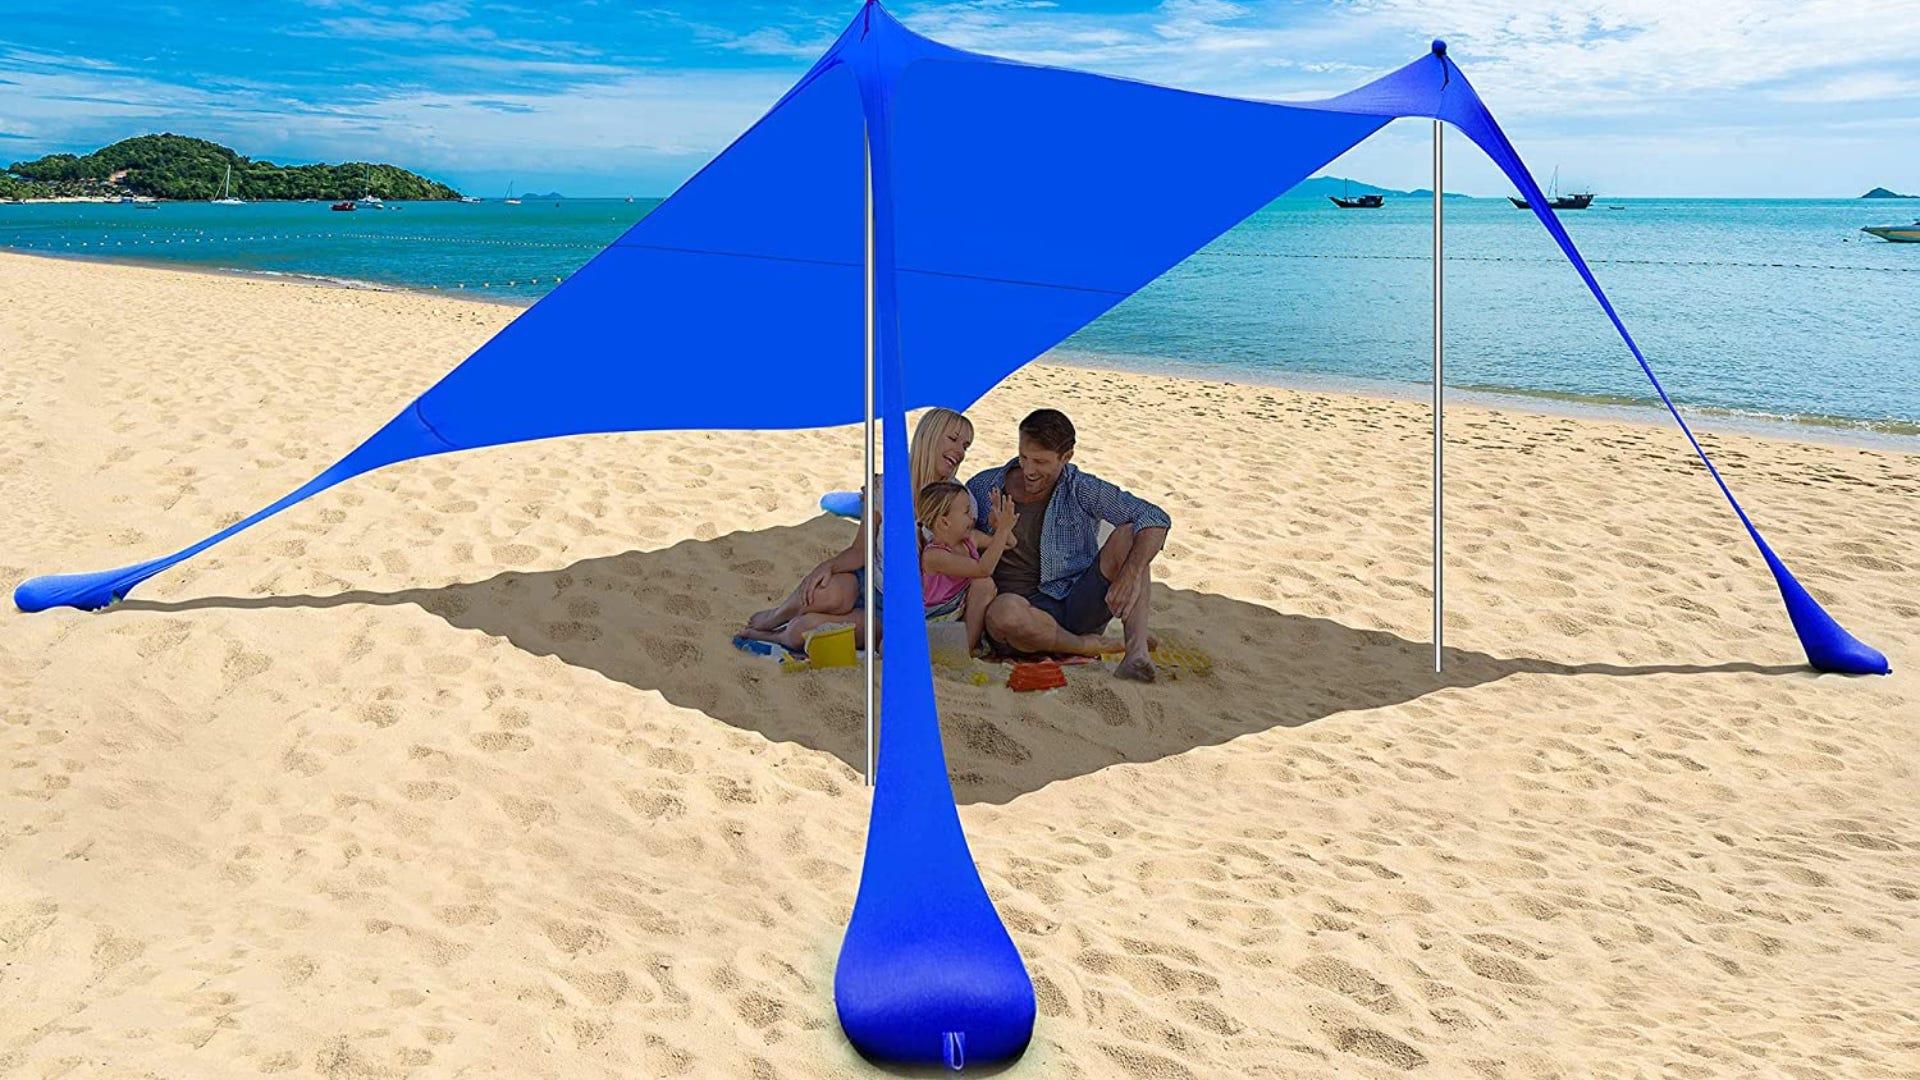 A navy blue canopy with sand anchors shading a family on the beach.